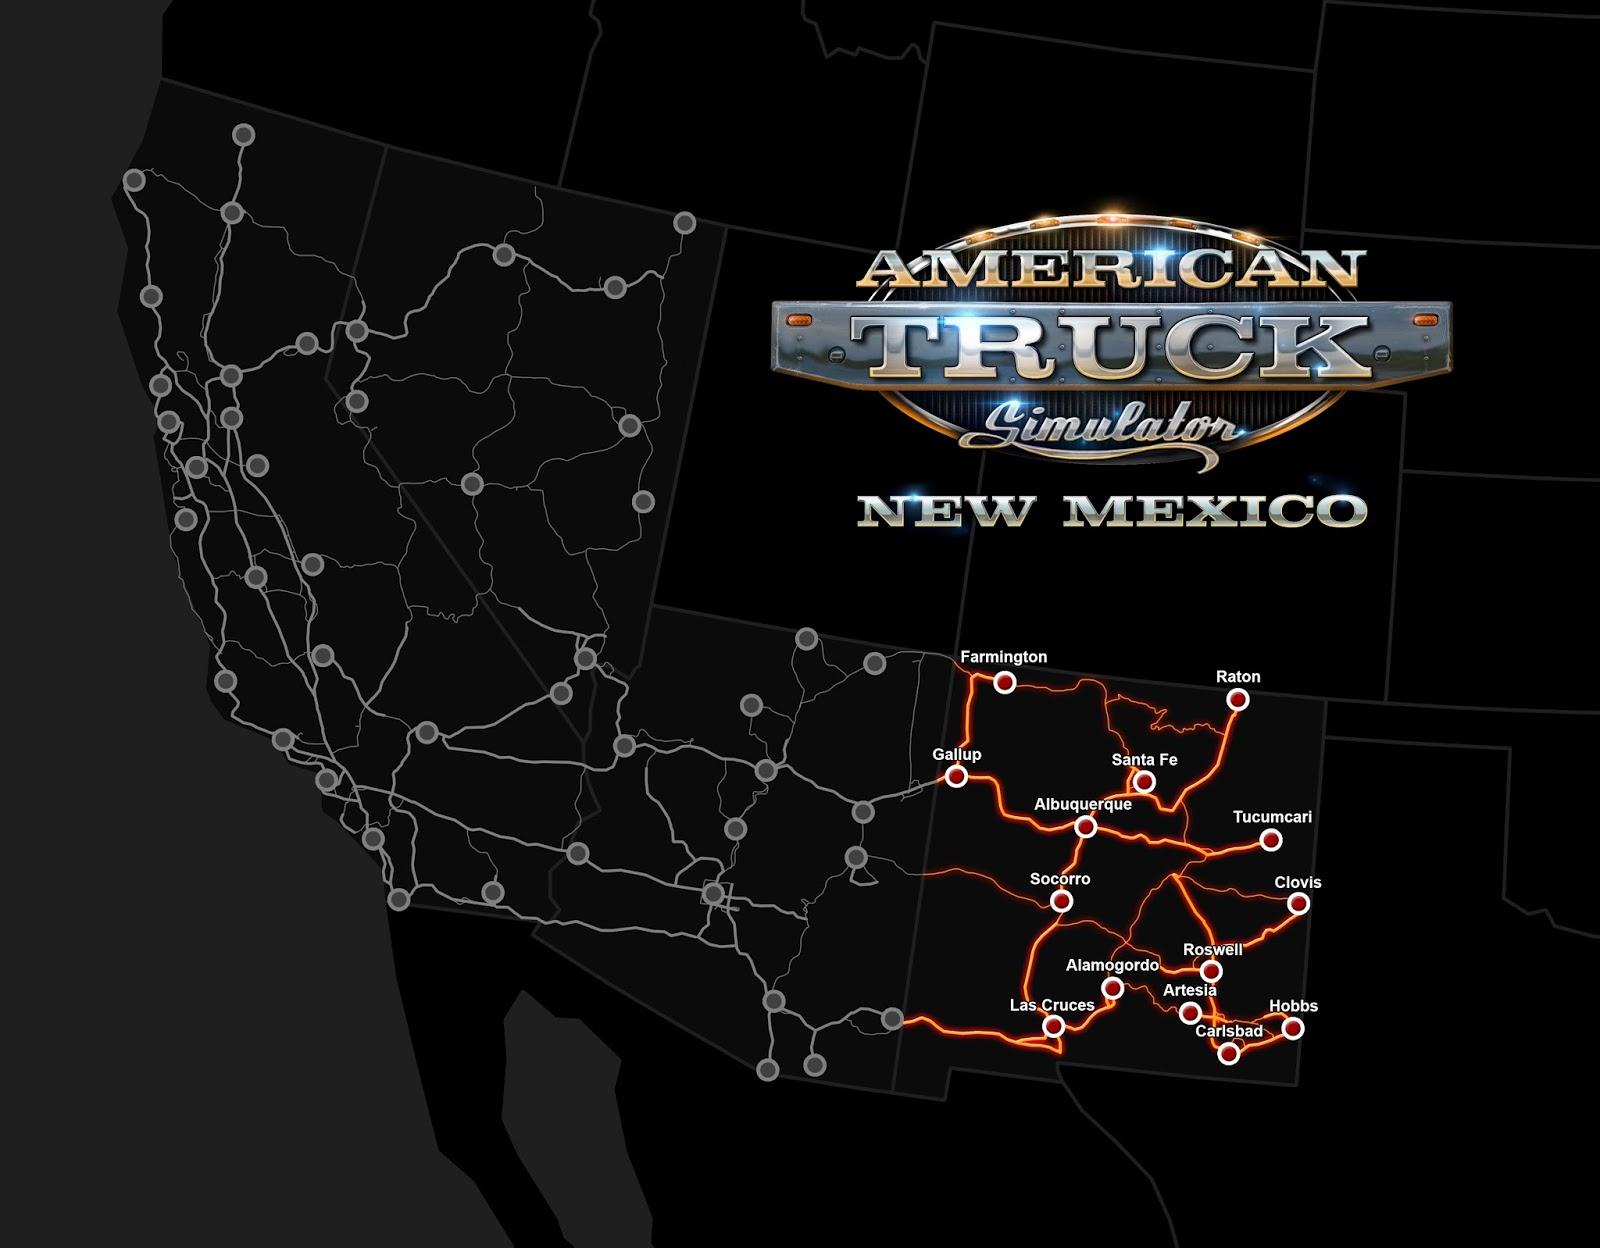 New Mexico DLC arrives alongside ATS update 1.29!   ATS Mod